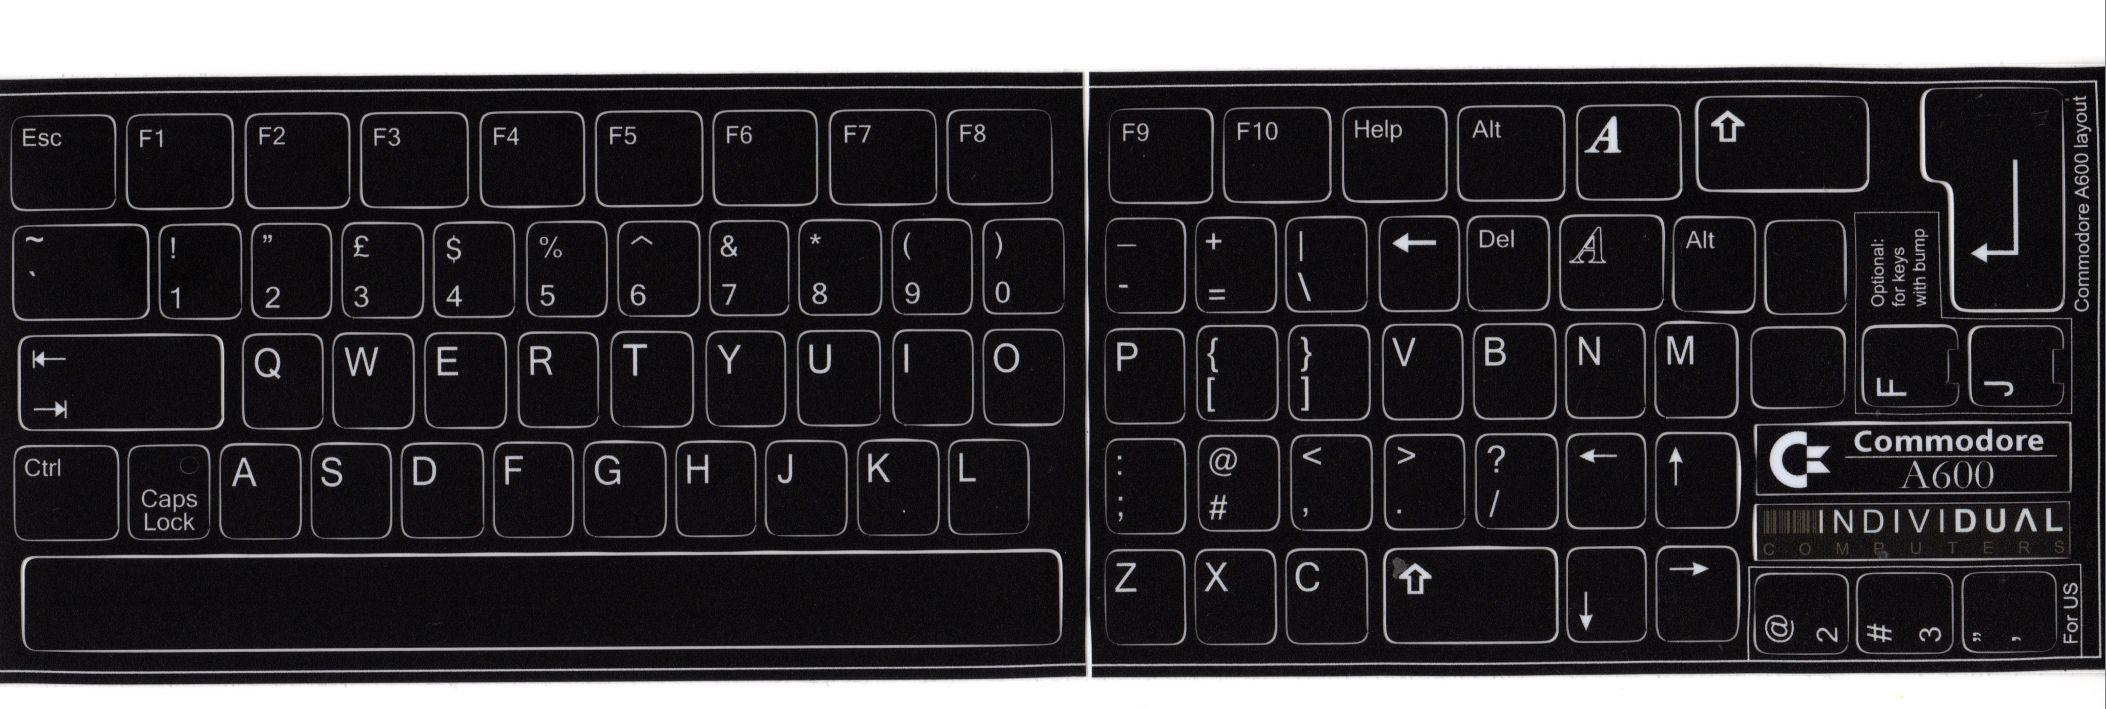 Amiga Keyboard non numeric keypad Sticker - A600 style